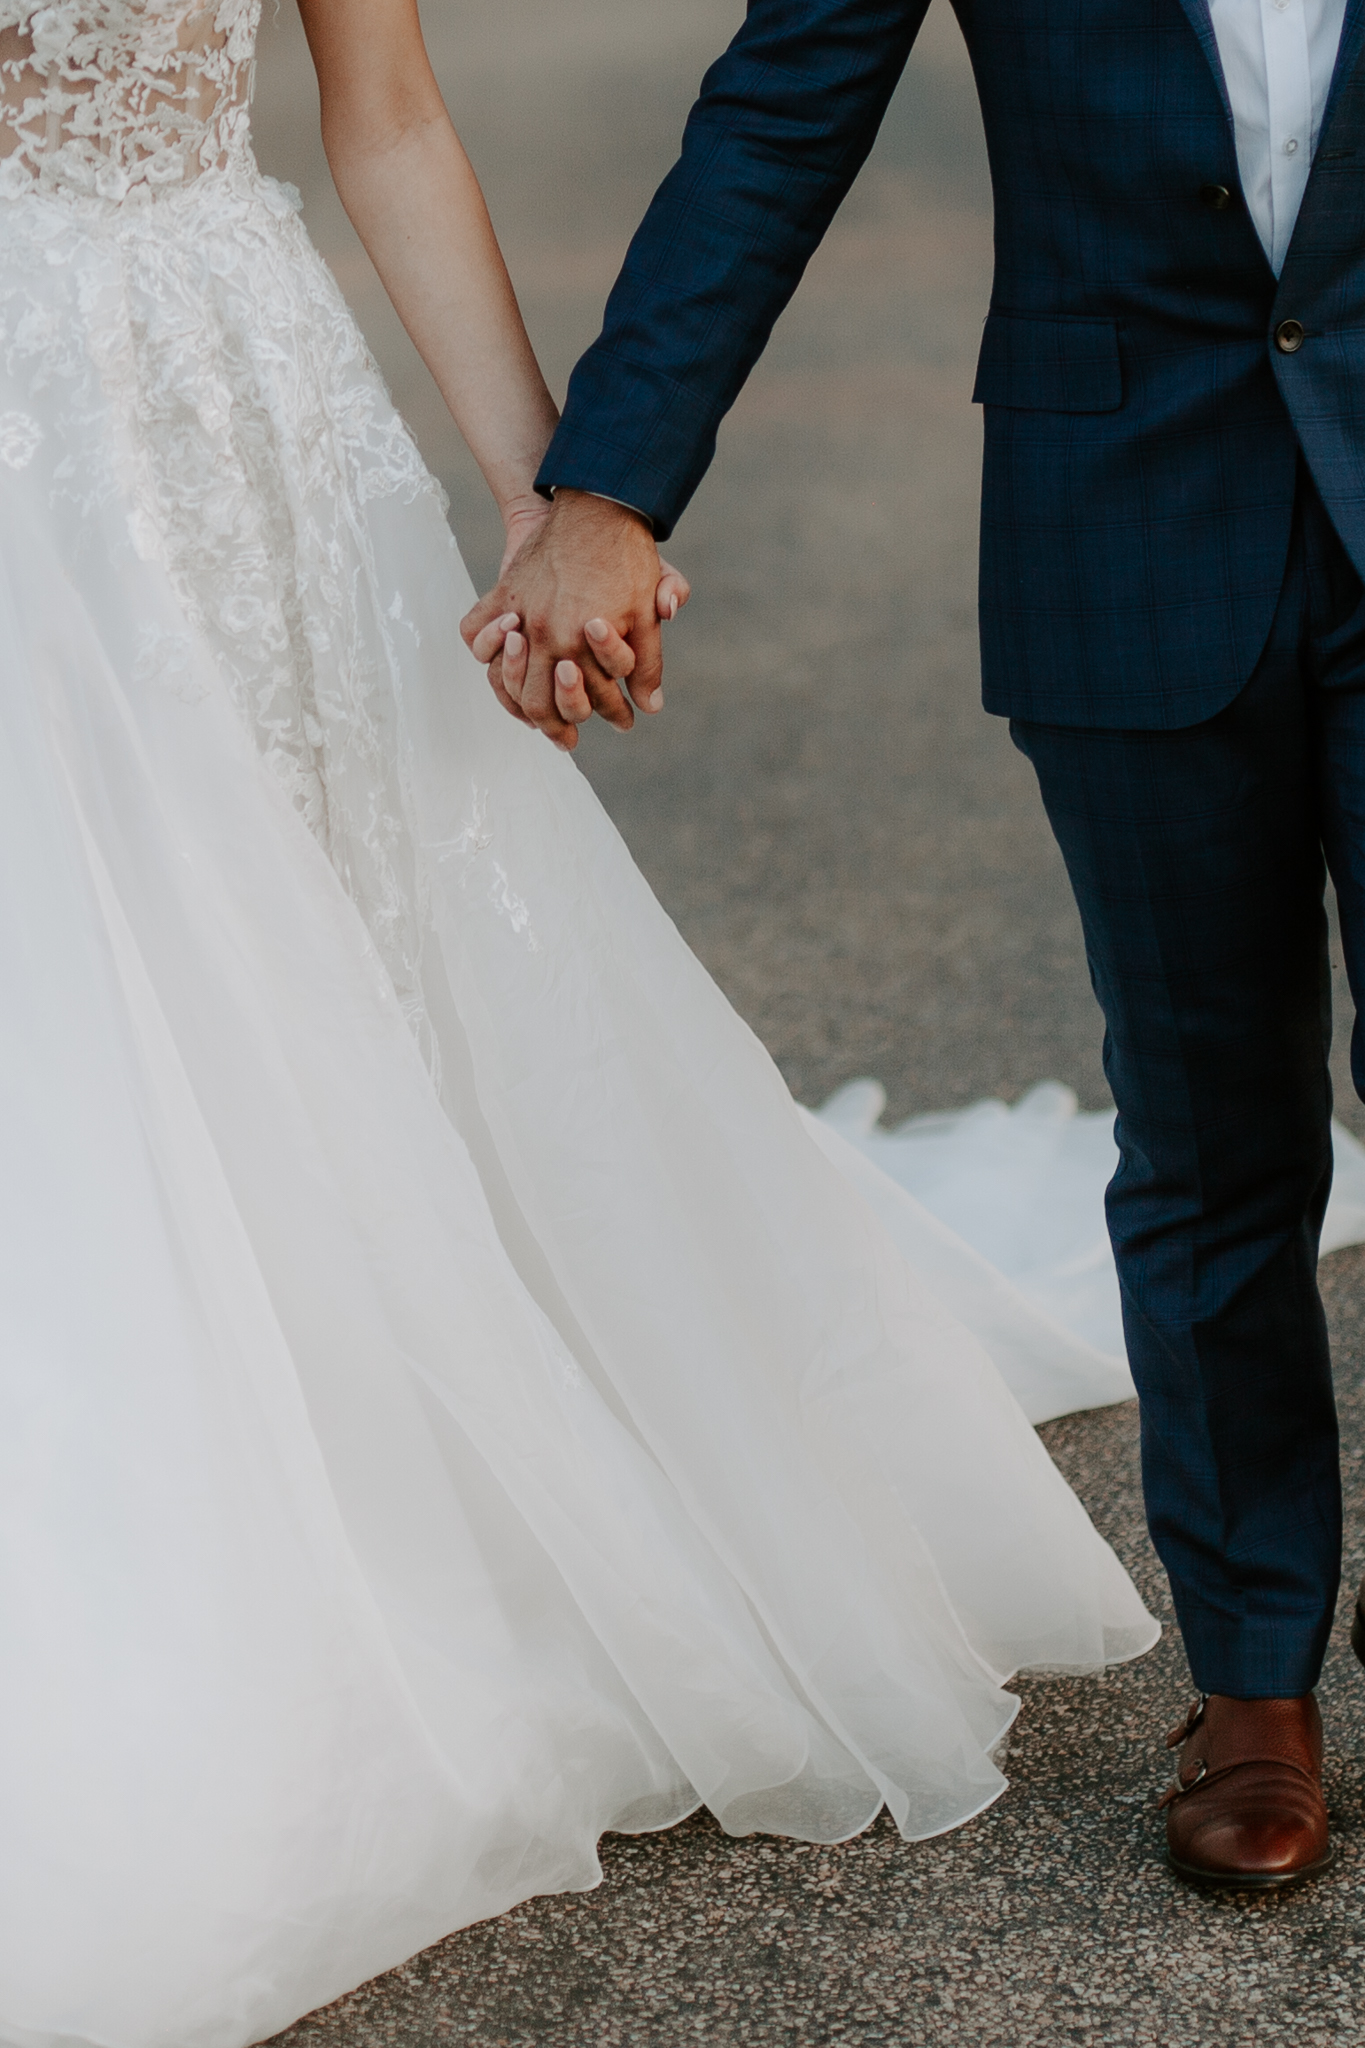 The-Stones-of-Yarra-Valley-Wedding-EmotionsandMathPhotography-225.jpg